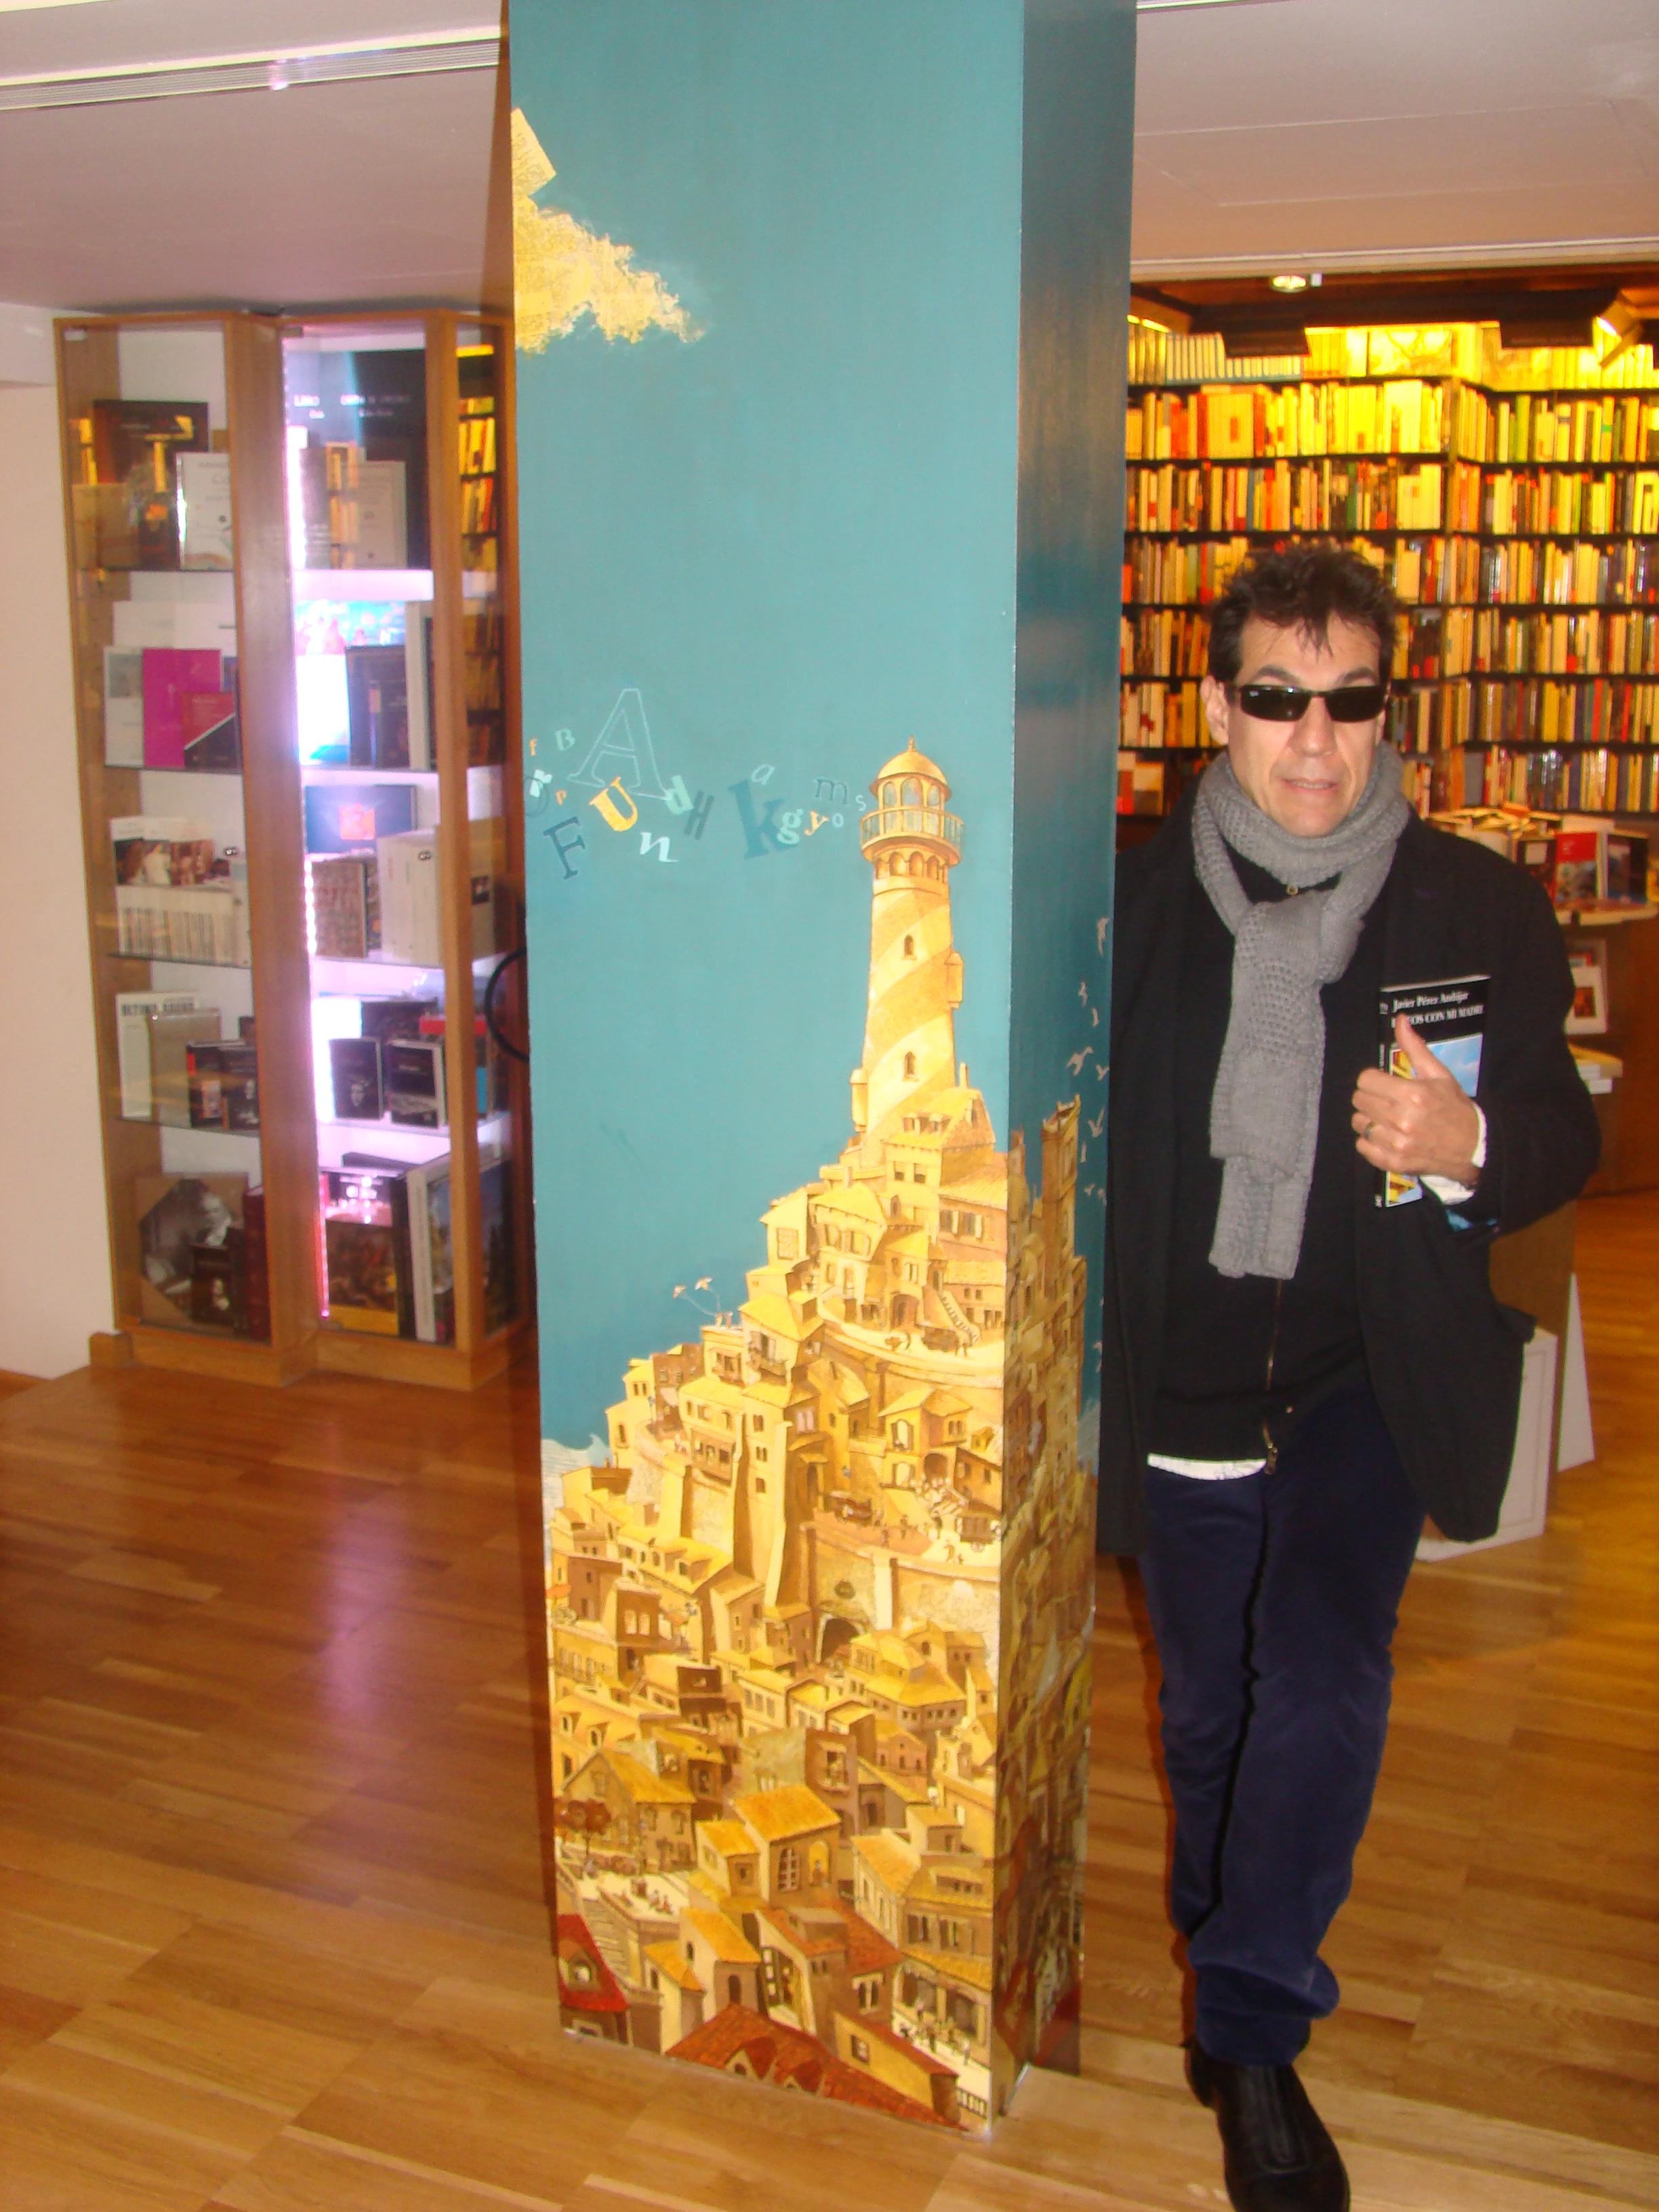 B en La Biblioteca de Babel